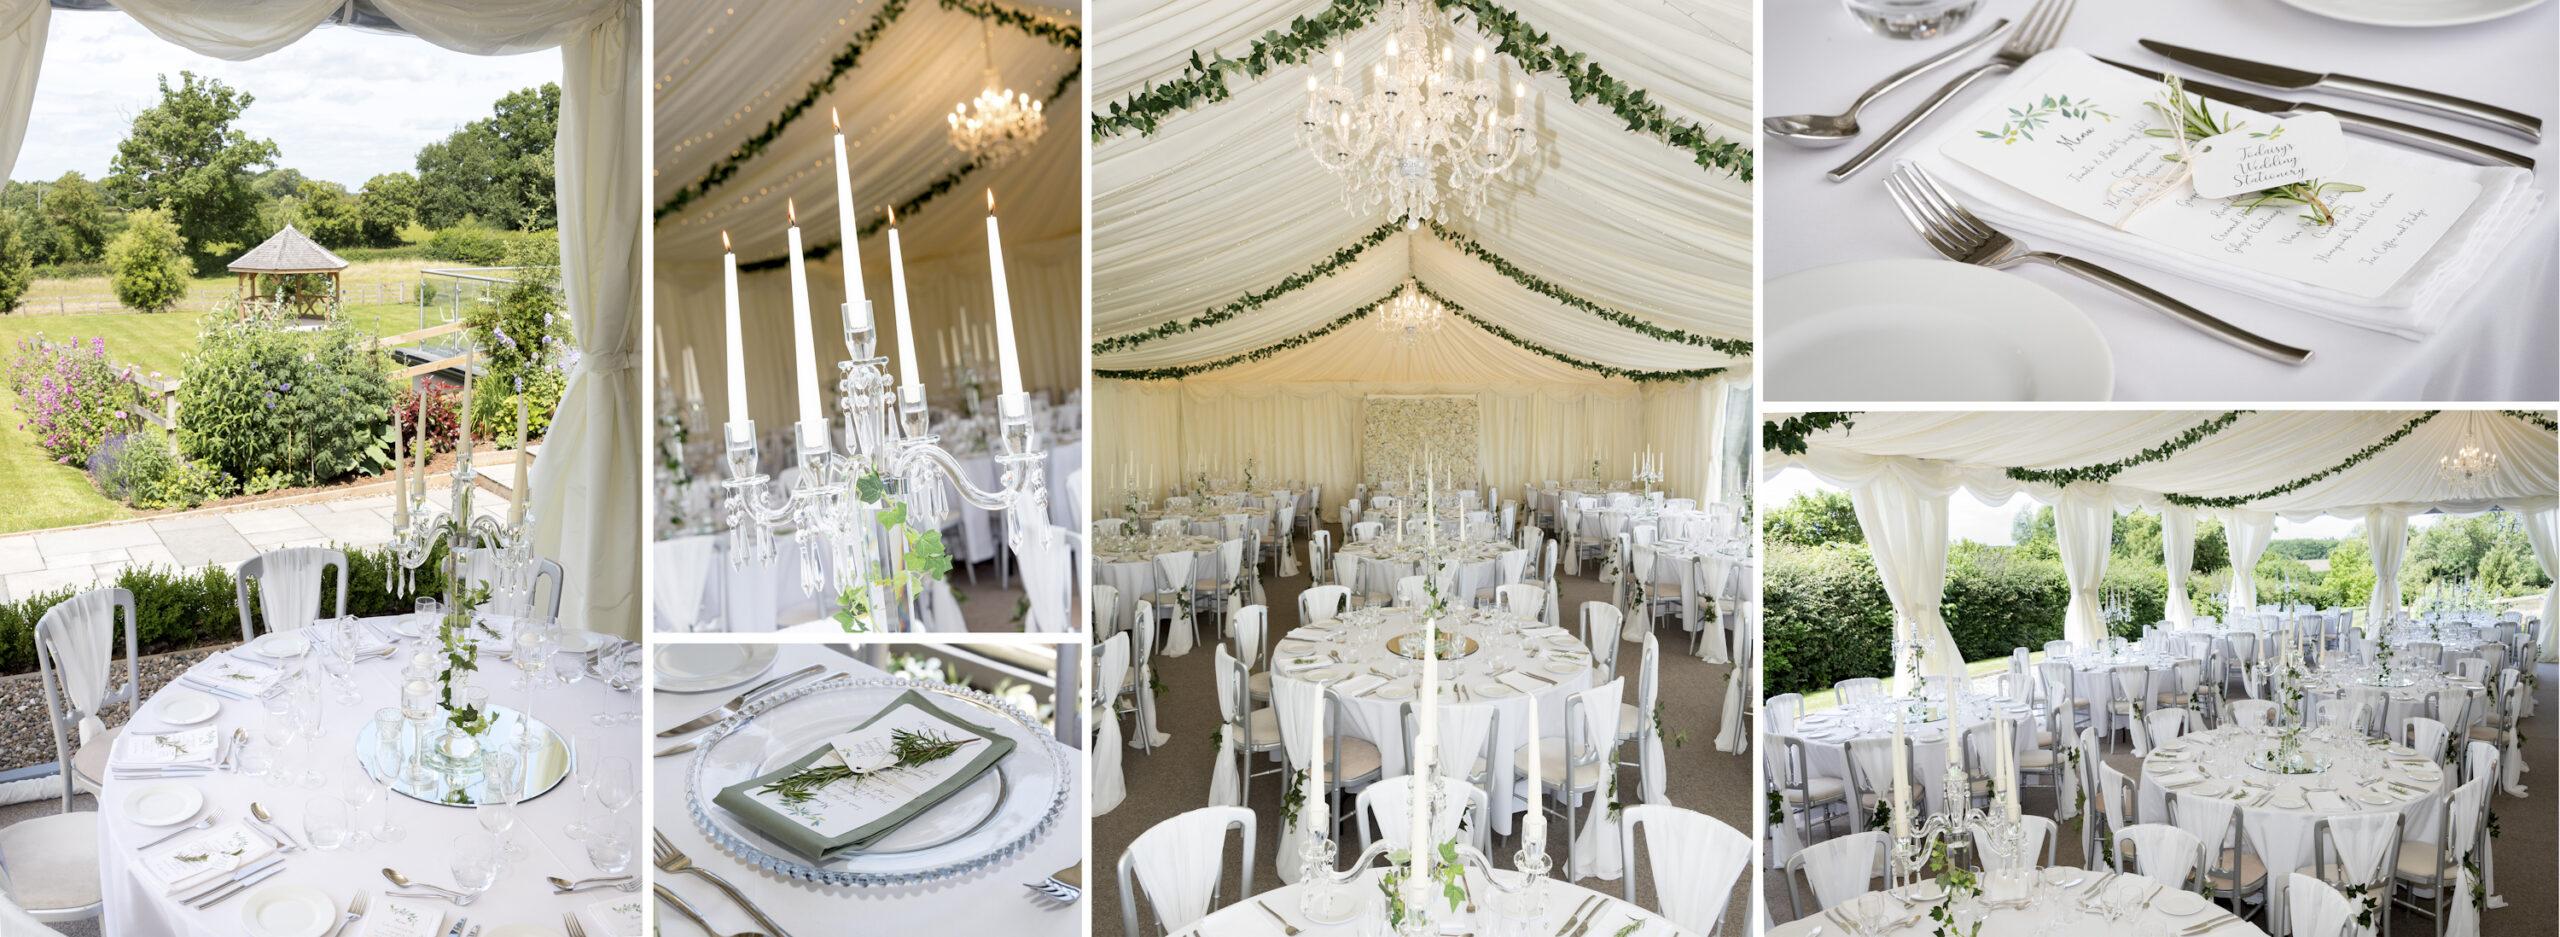 Wedding Venue Manor Hill House